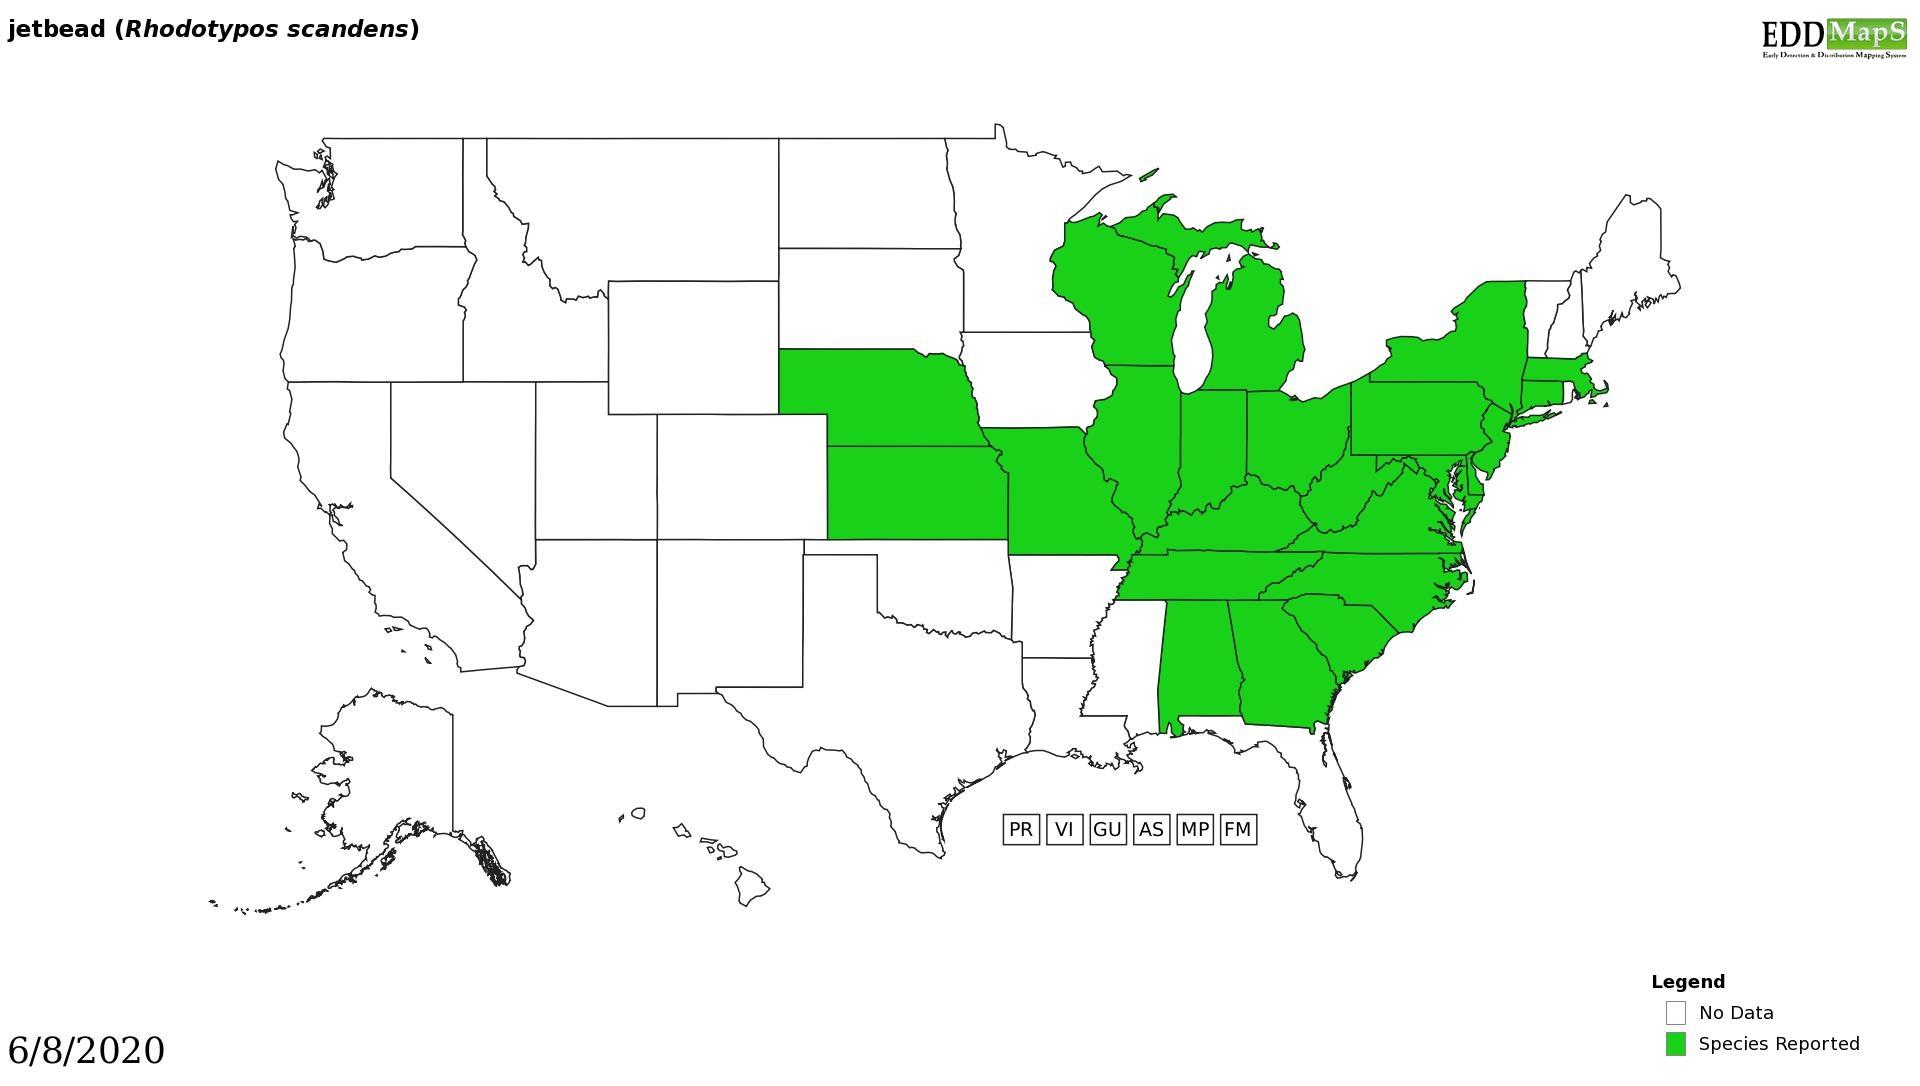 Jetbead distribution - United States